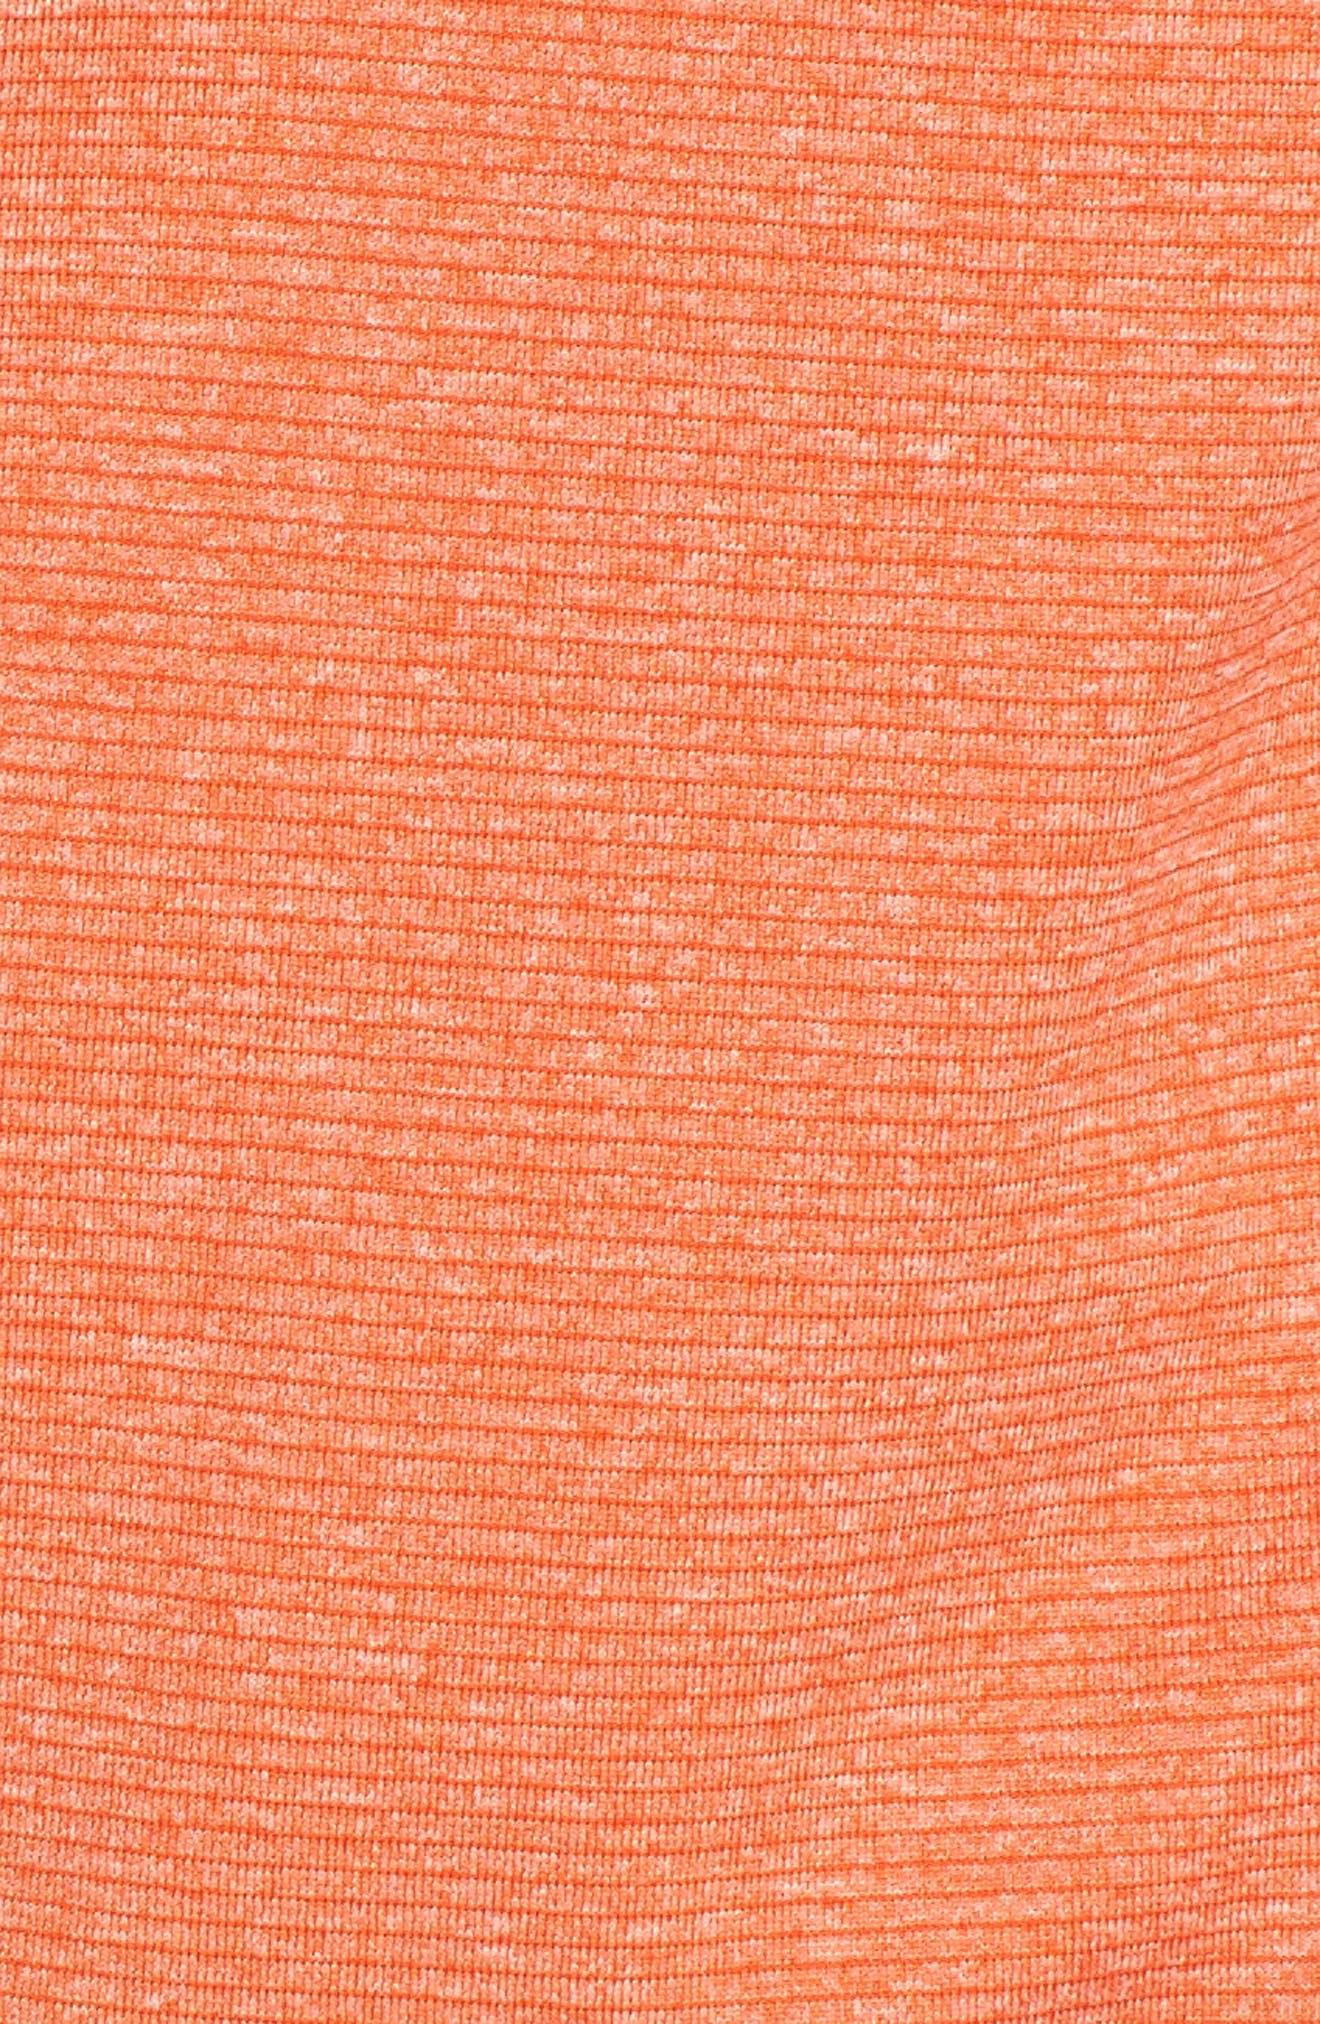 Shoreline - Cleveland Browns Half Zip Pullover,                             Alternate thumbnail 4, color,                             College Orange Heather